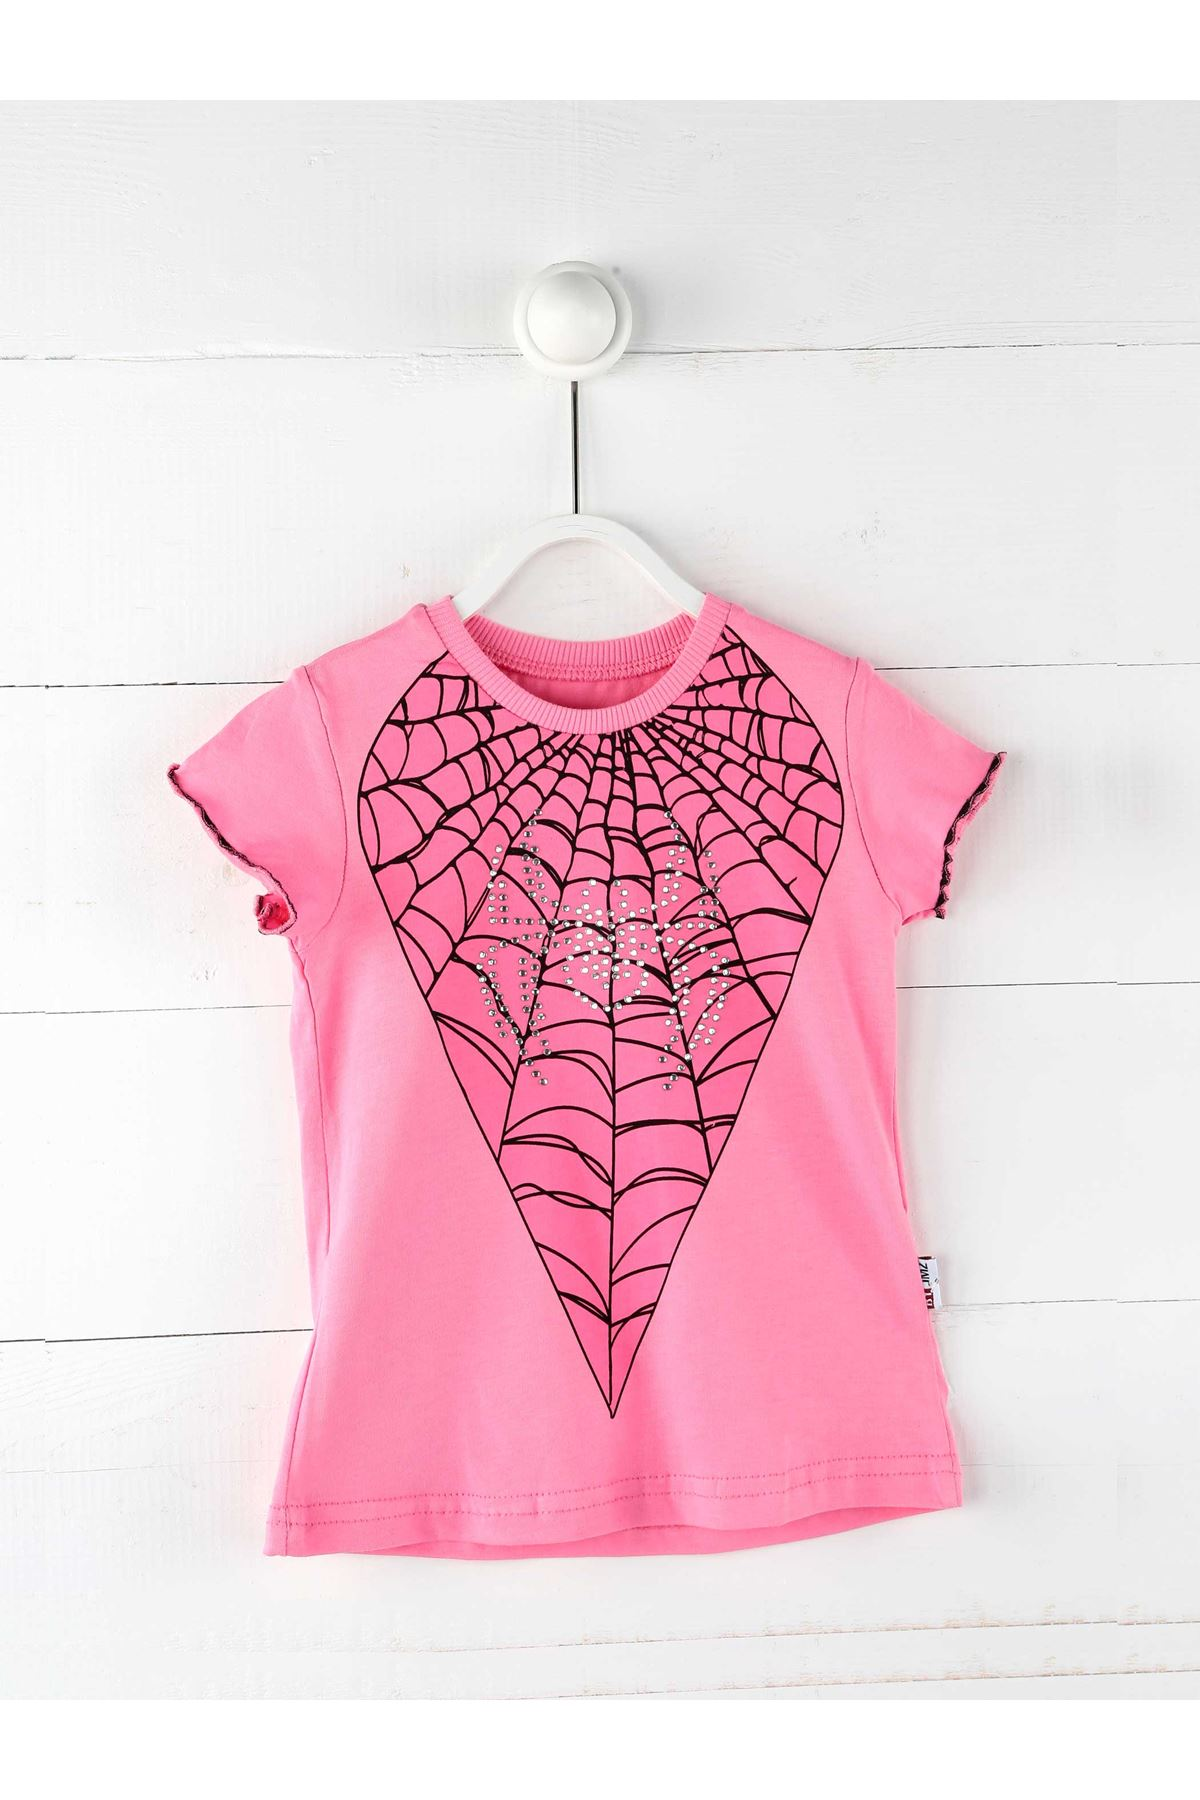 Pink Summer Girls Kids Skirted Suit